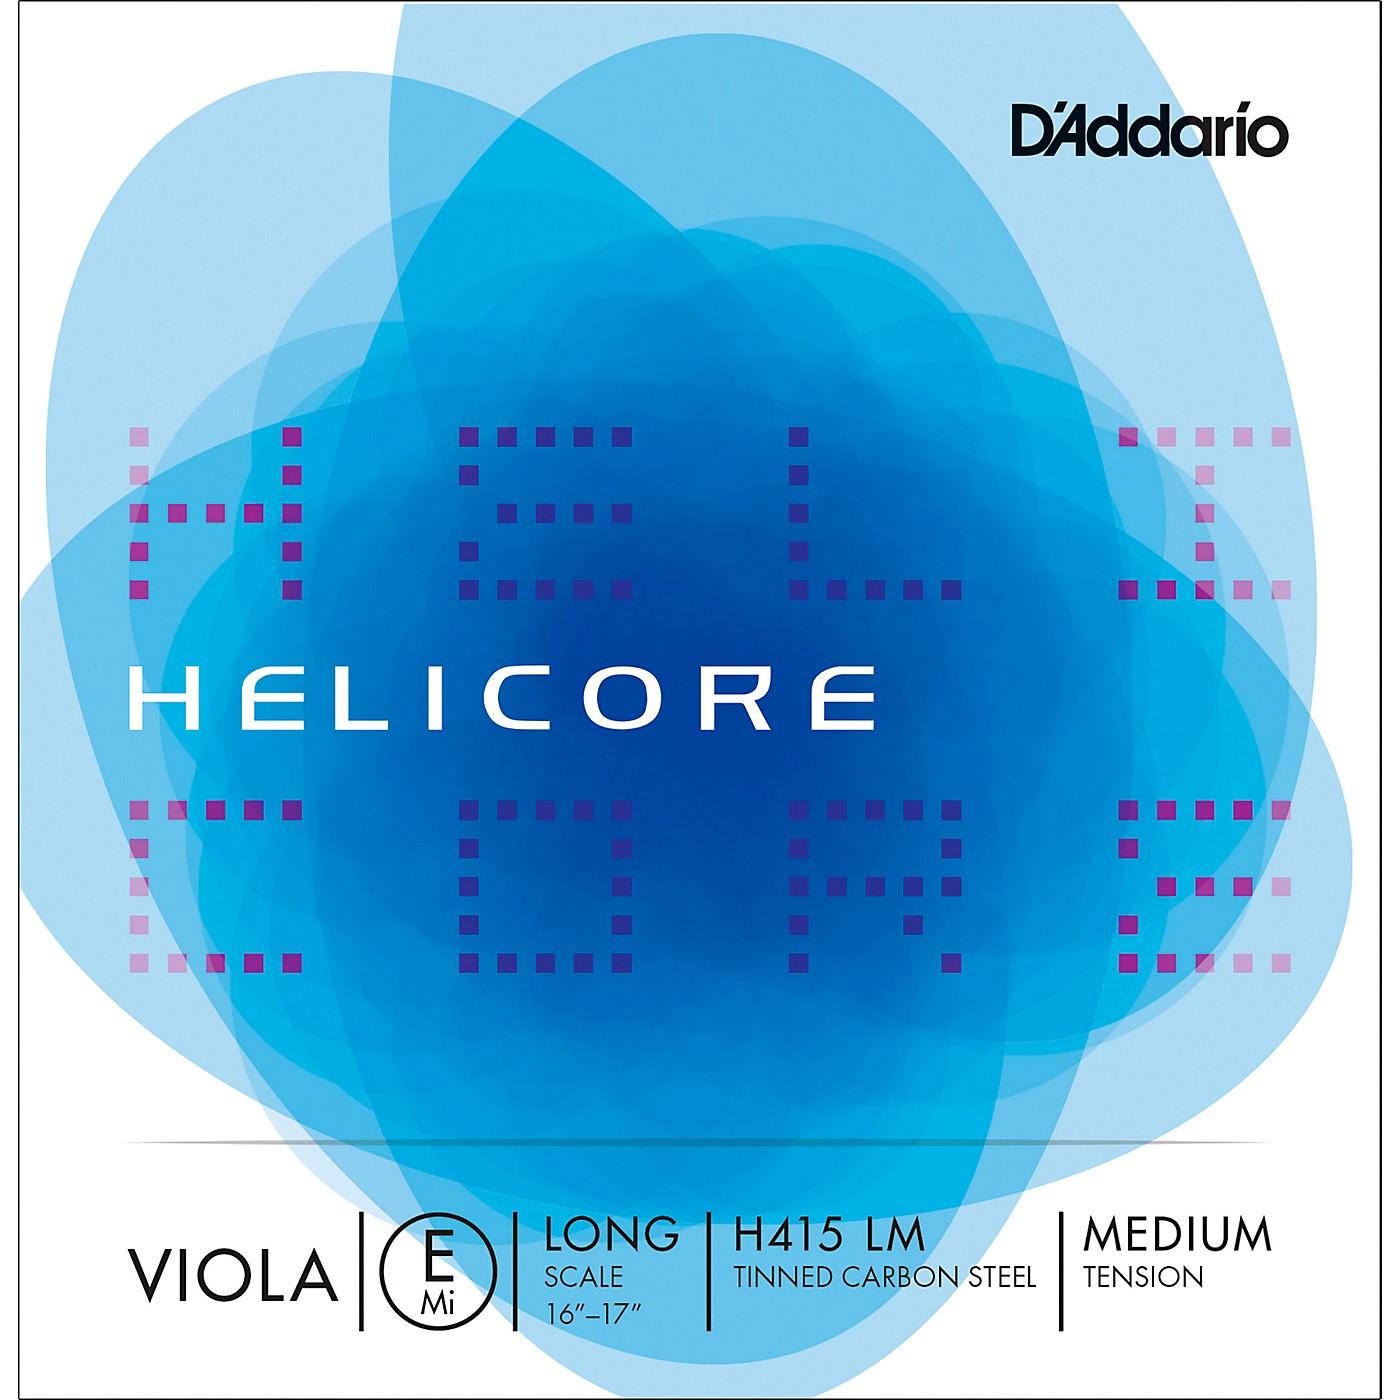 D'Addario Helicore Viola E String thumbnail